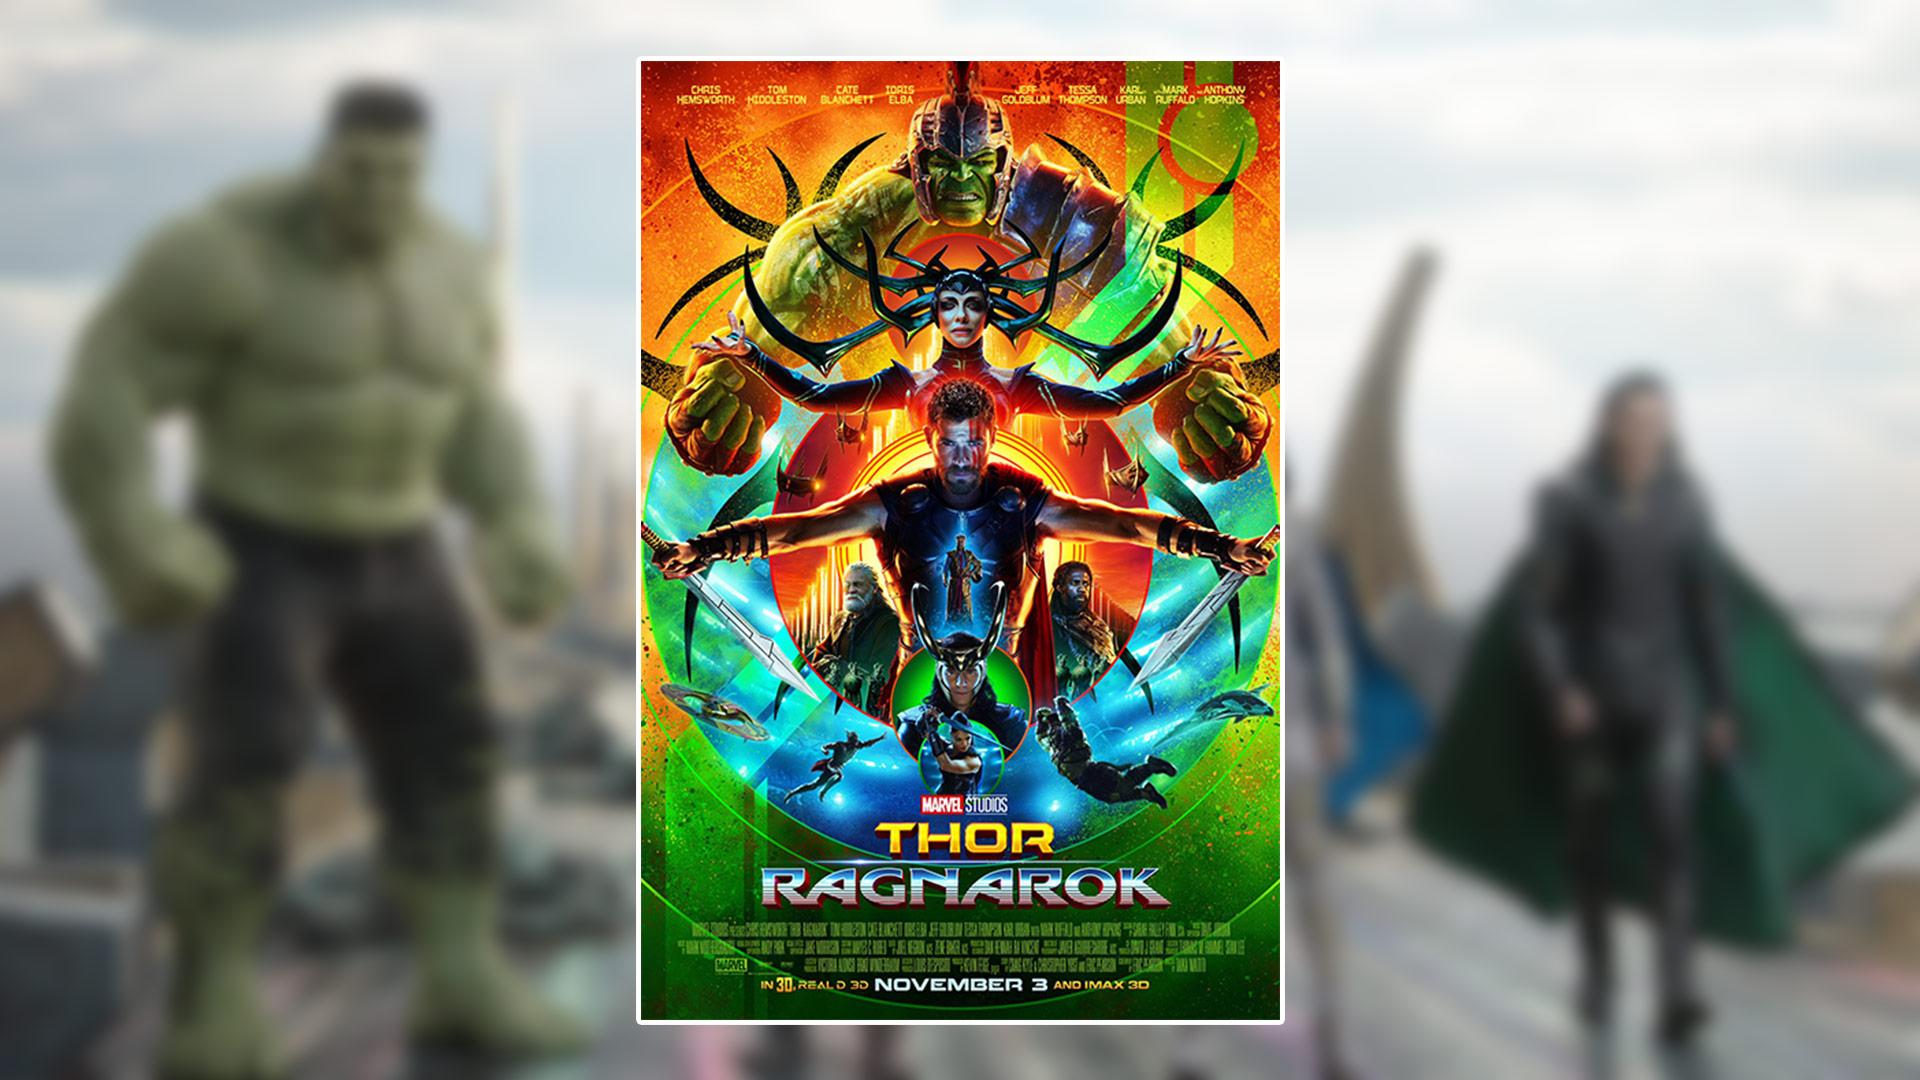 [Critique Film] Thor : Ragnarok de Taika Waititi